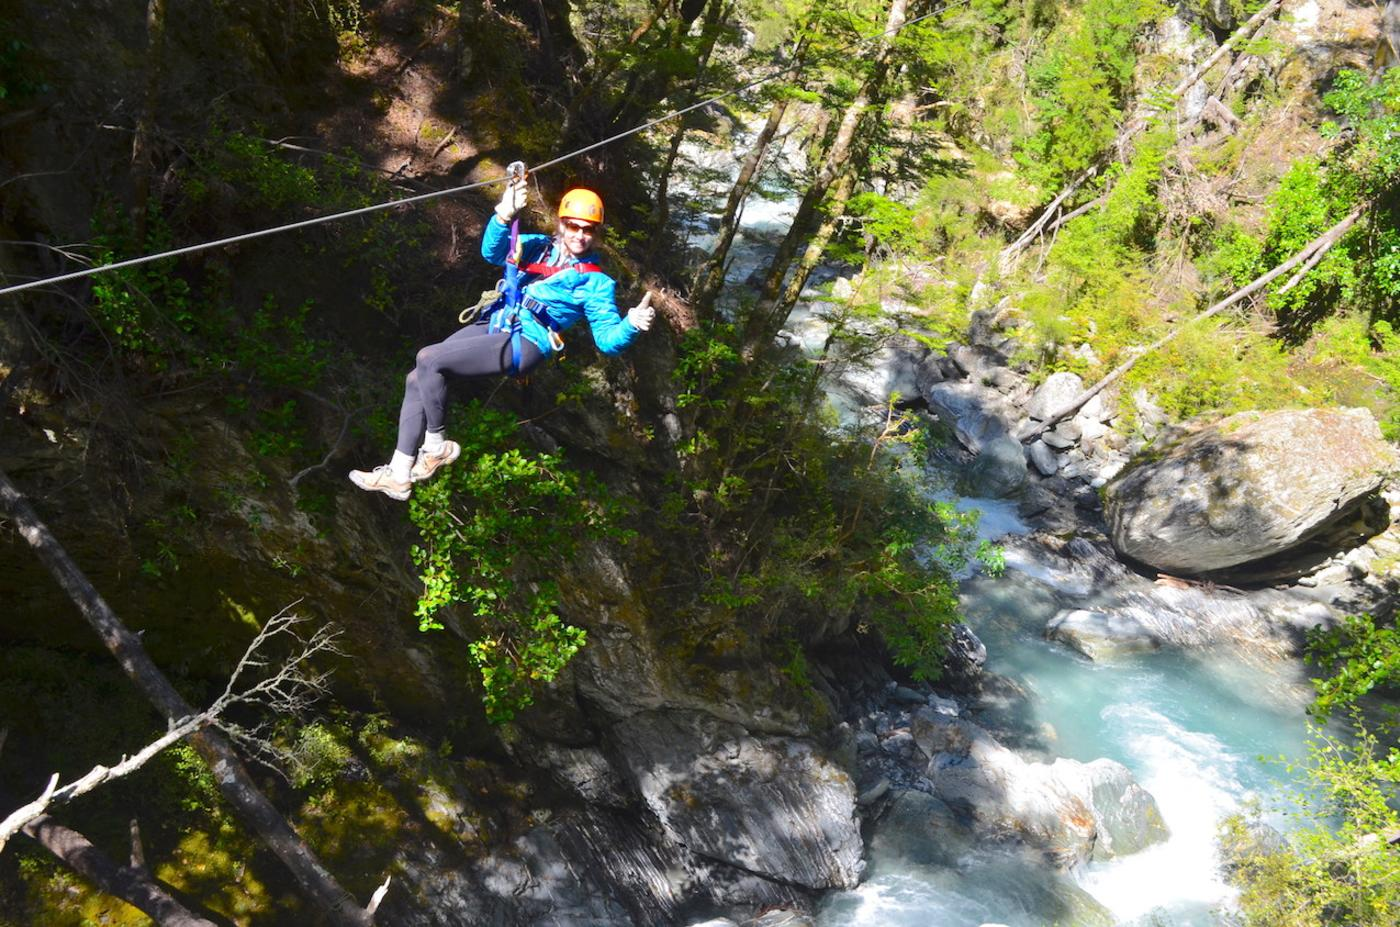 Lady ziplining in Glenorchy